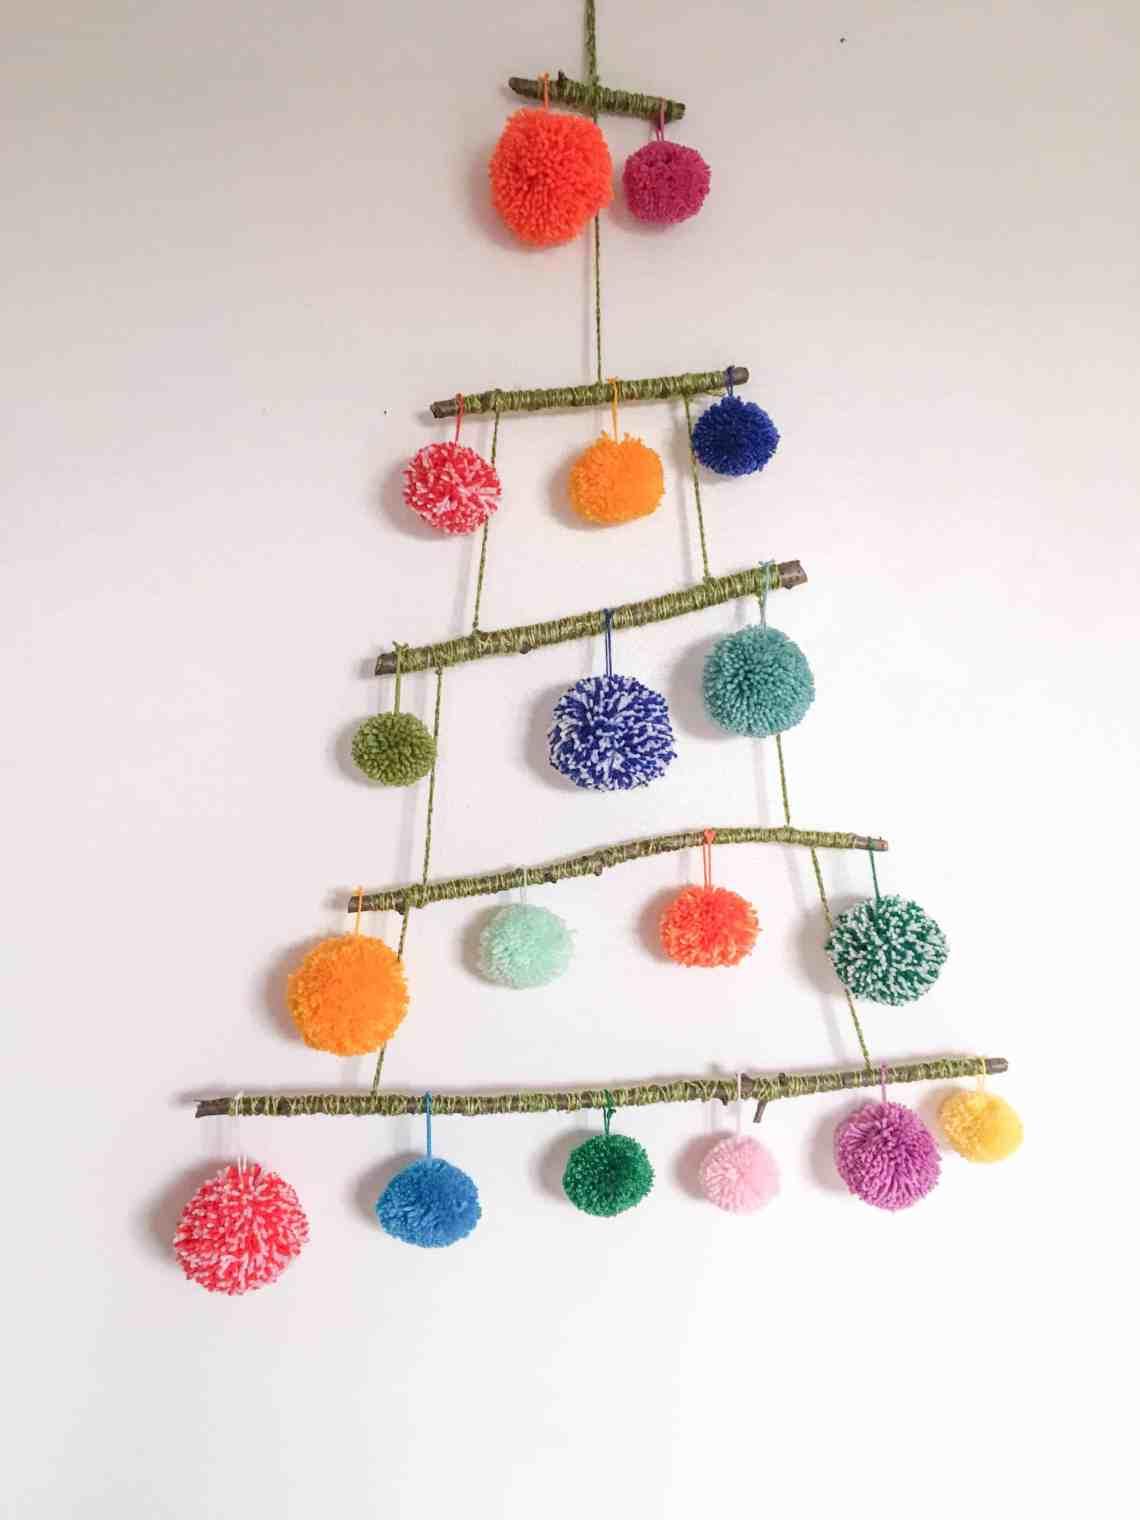 pom-pom alternative christmas tree craft project with colourful yarn